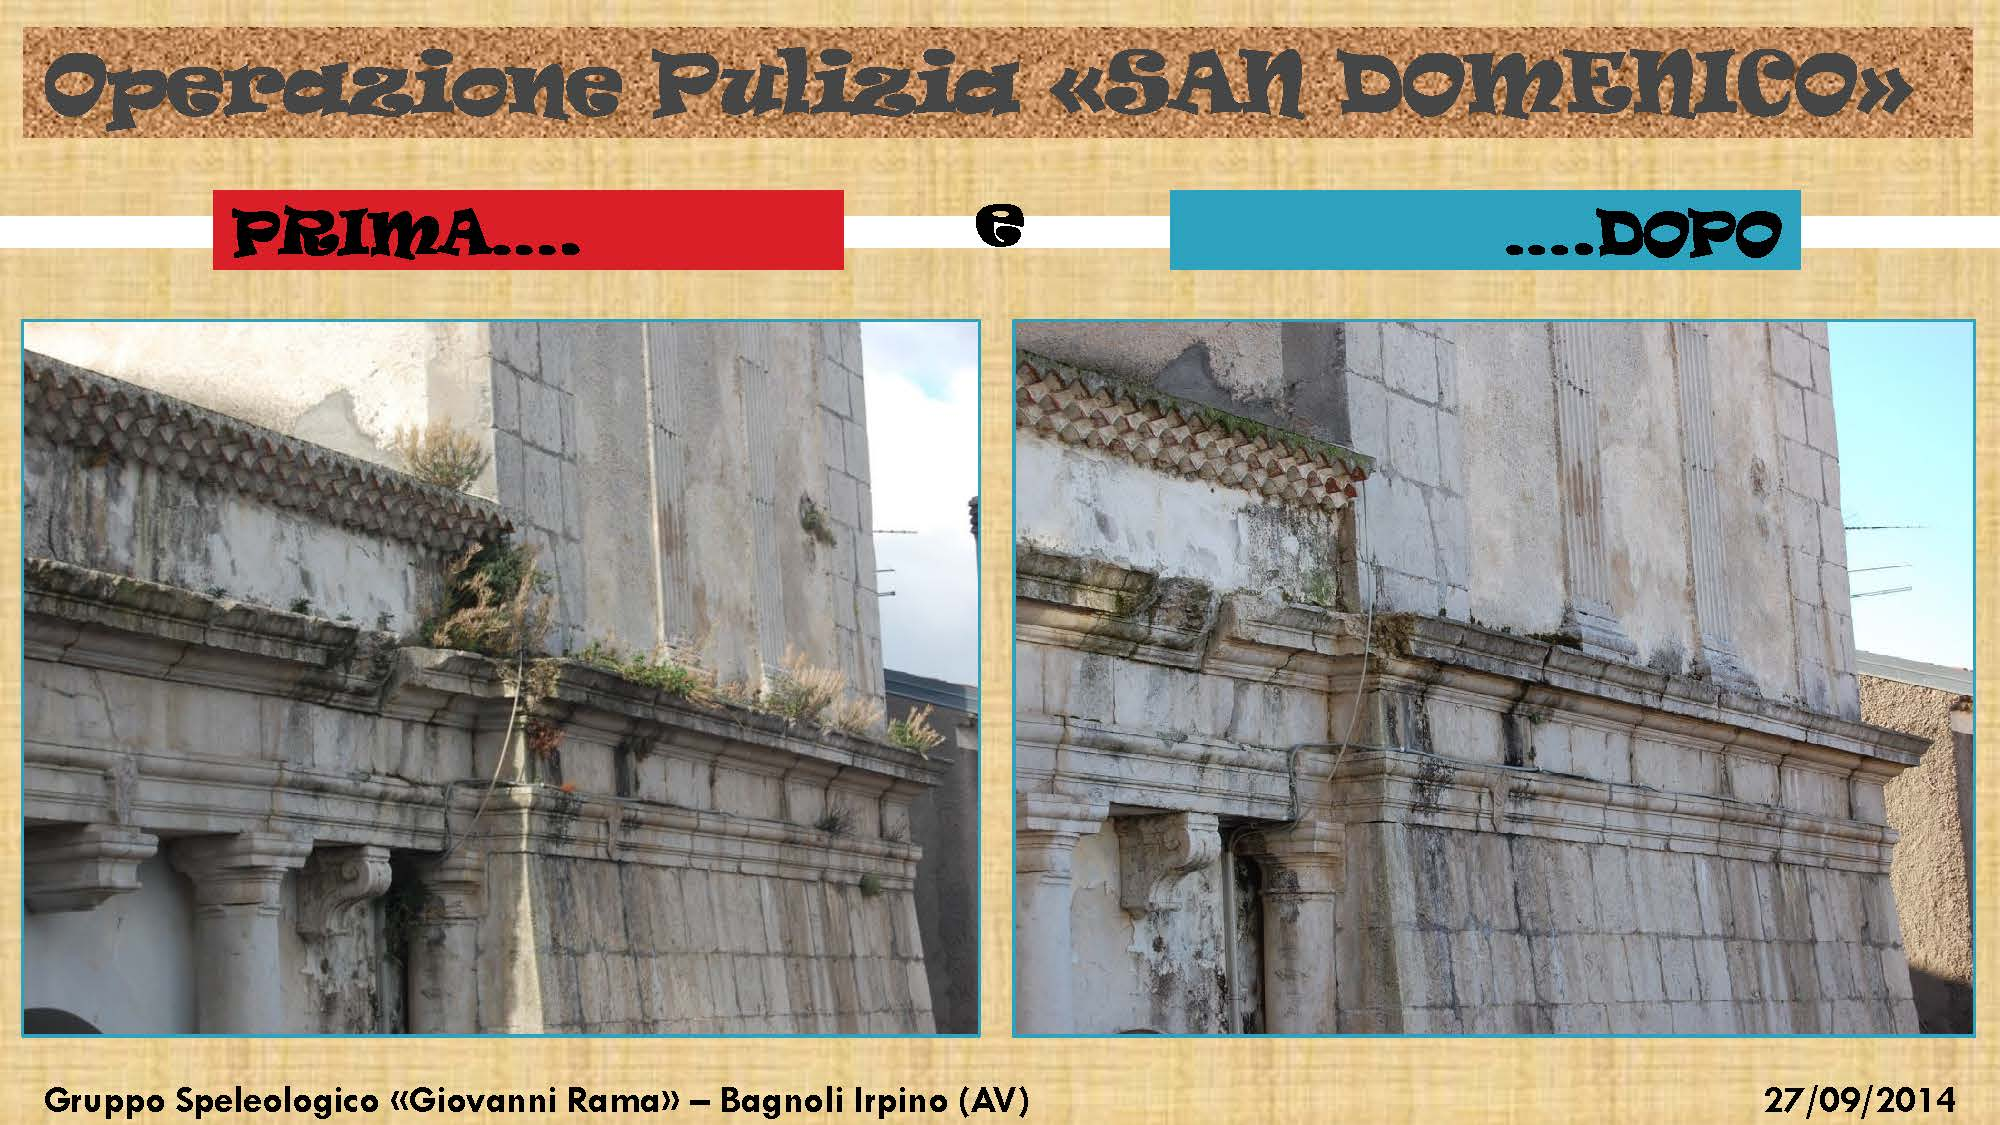 Bagnoli-Pulizia-San-Domenico-2014_Pagina_09